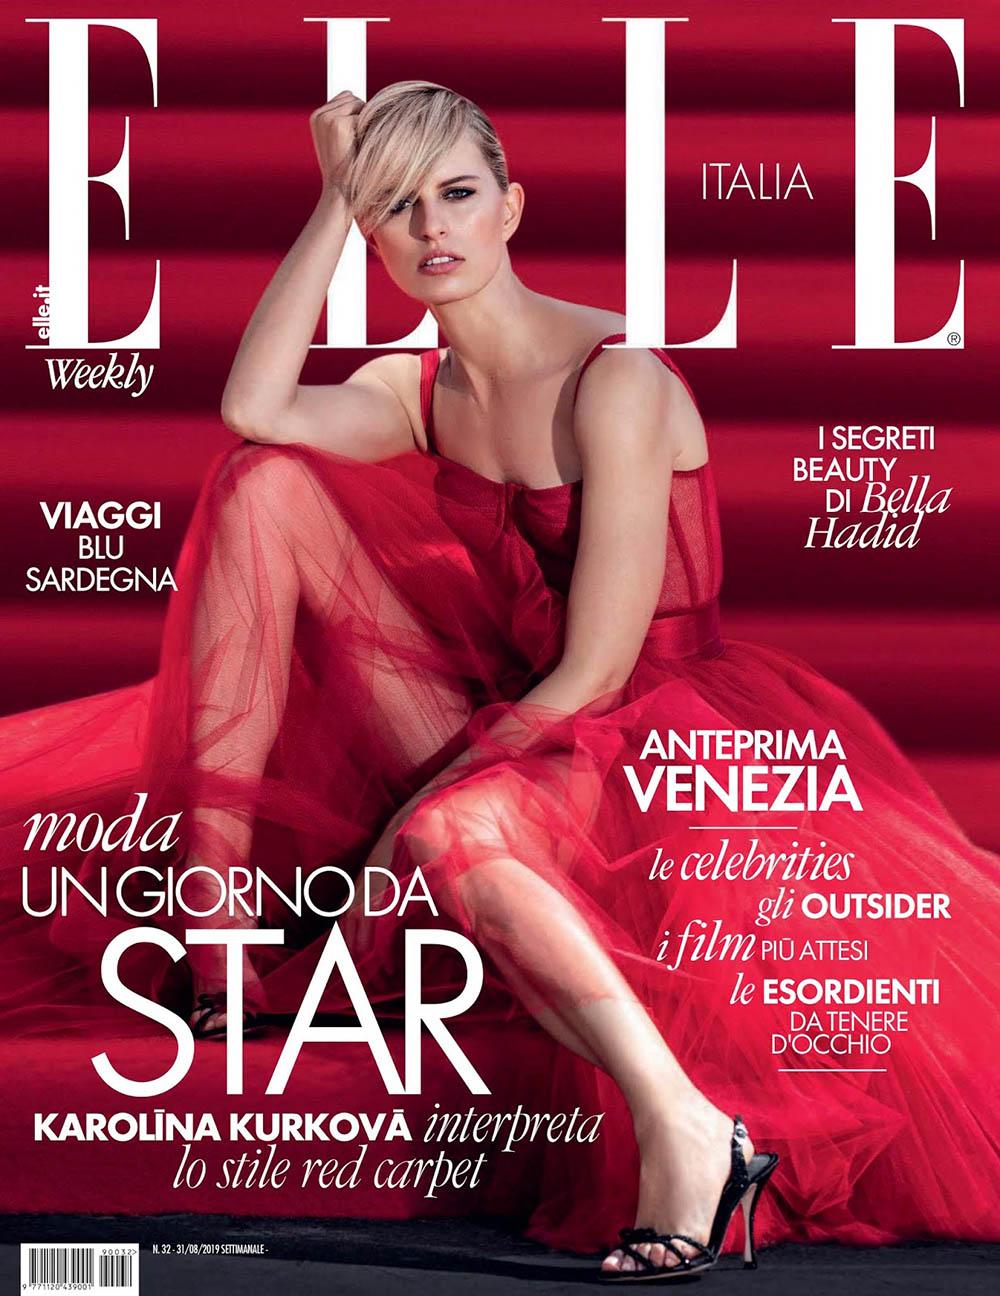 Karolina Kurkova covers Elle Italia August 19th, 2019 by Gilles Bensimon